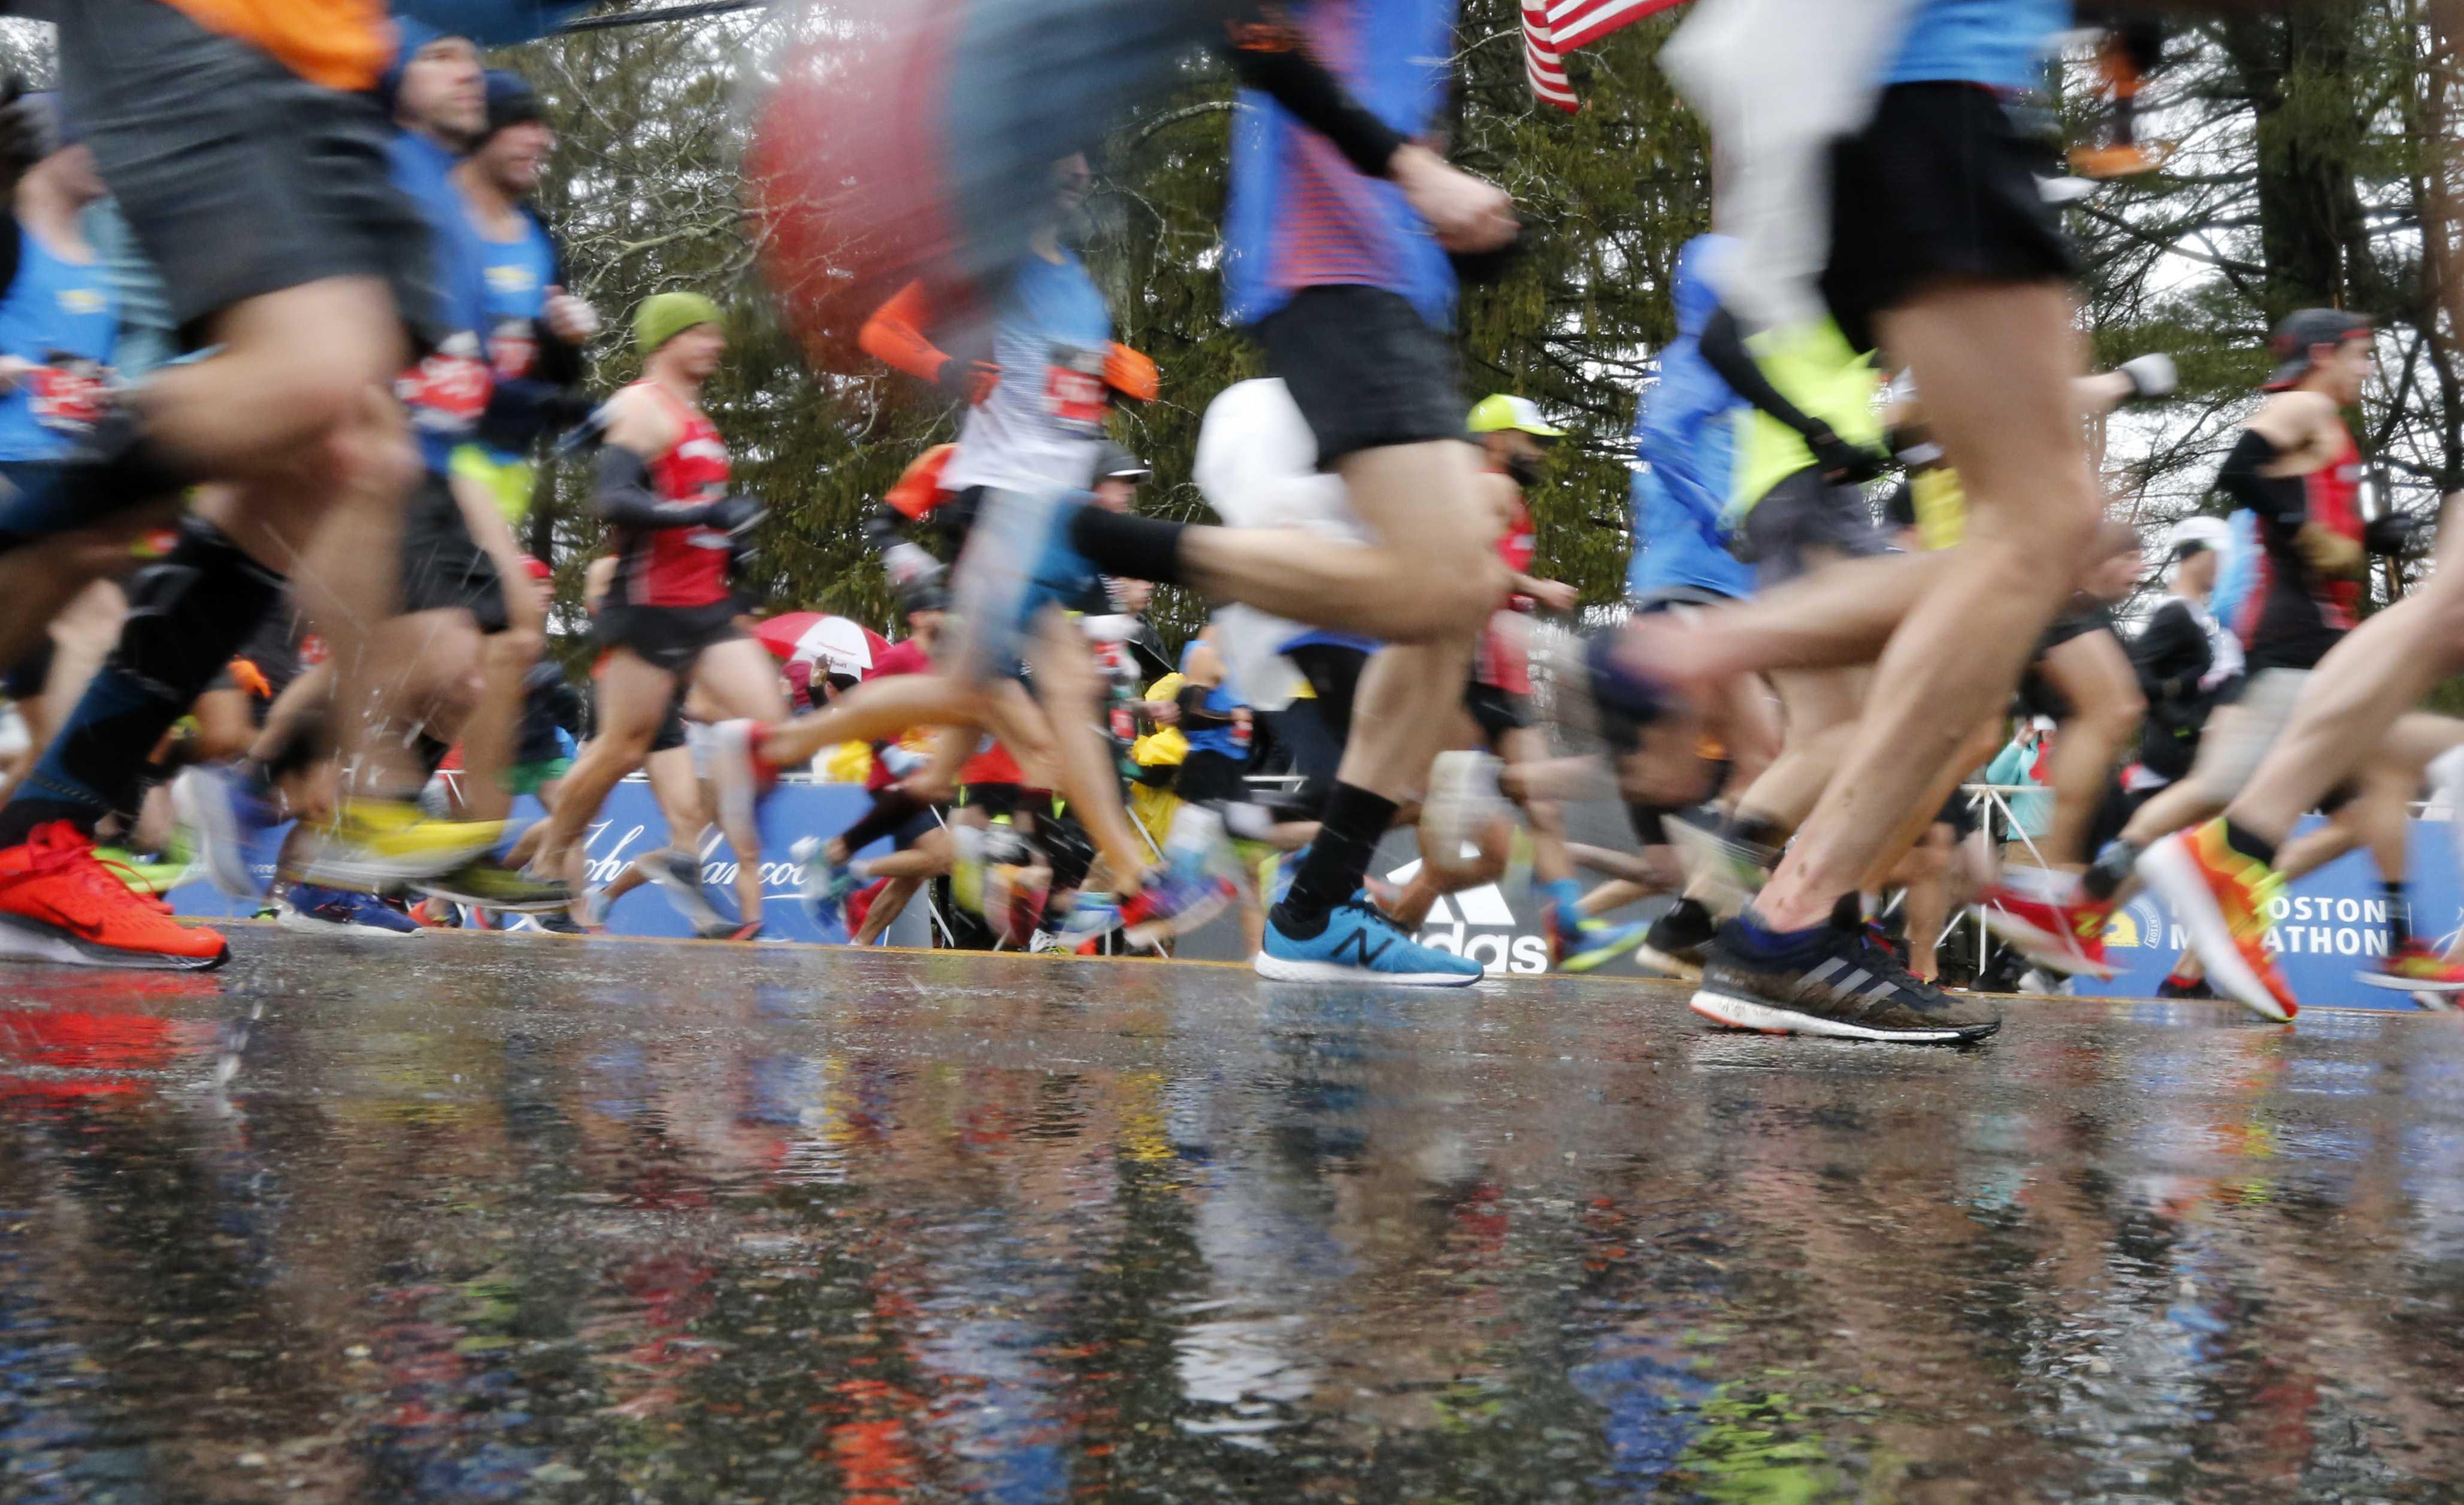 Heavy rain, strong winds for Marathon Monday | WCVB